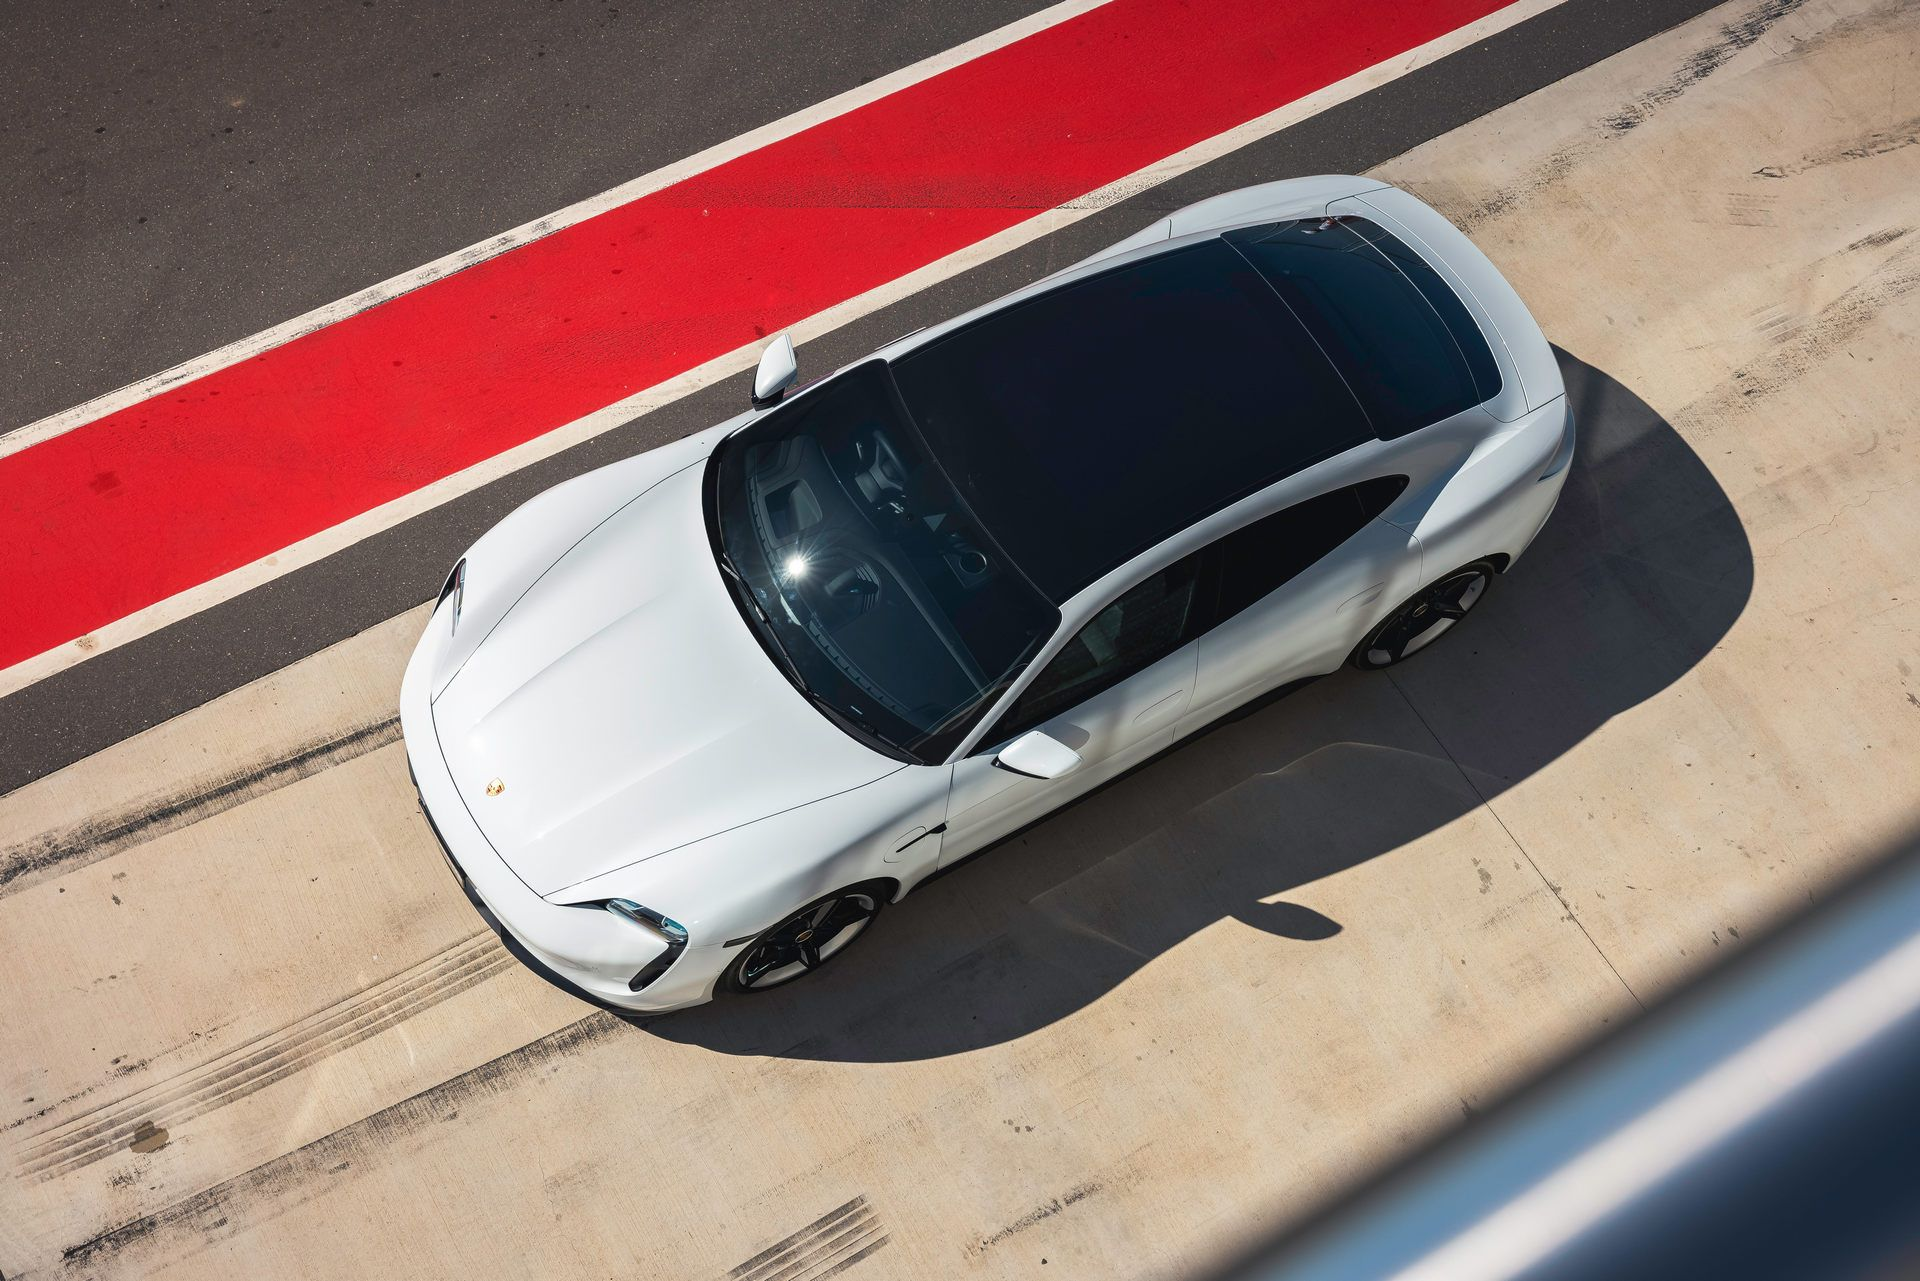 Porsche-Taycan-Turbo-S-The-Bend-Motorsport-Park-40